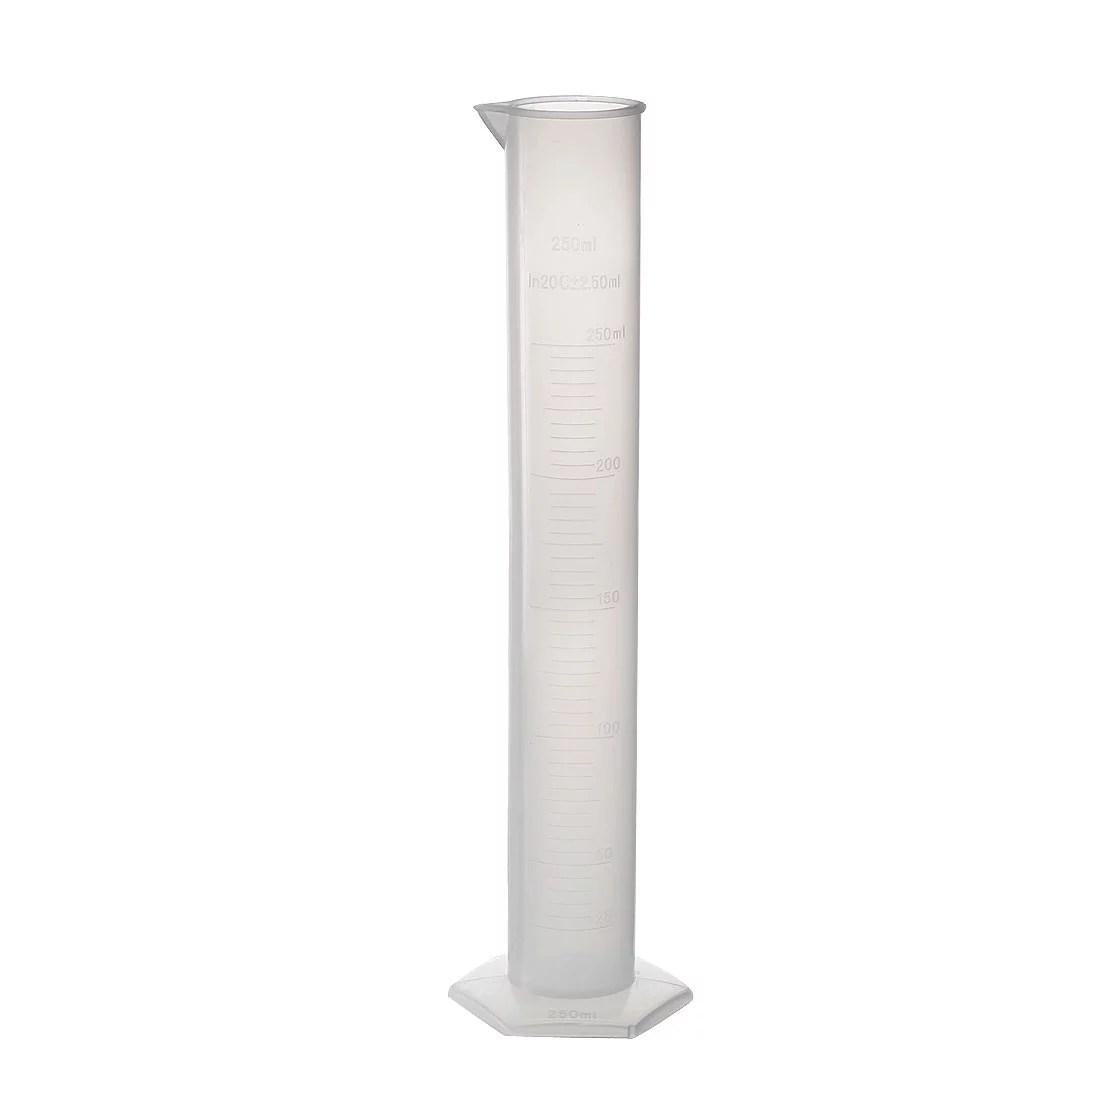 250ml Graduated Cylinder Laboratory Measurement Clear